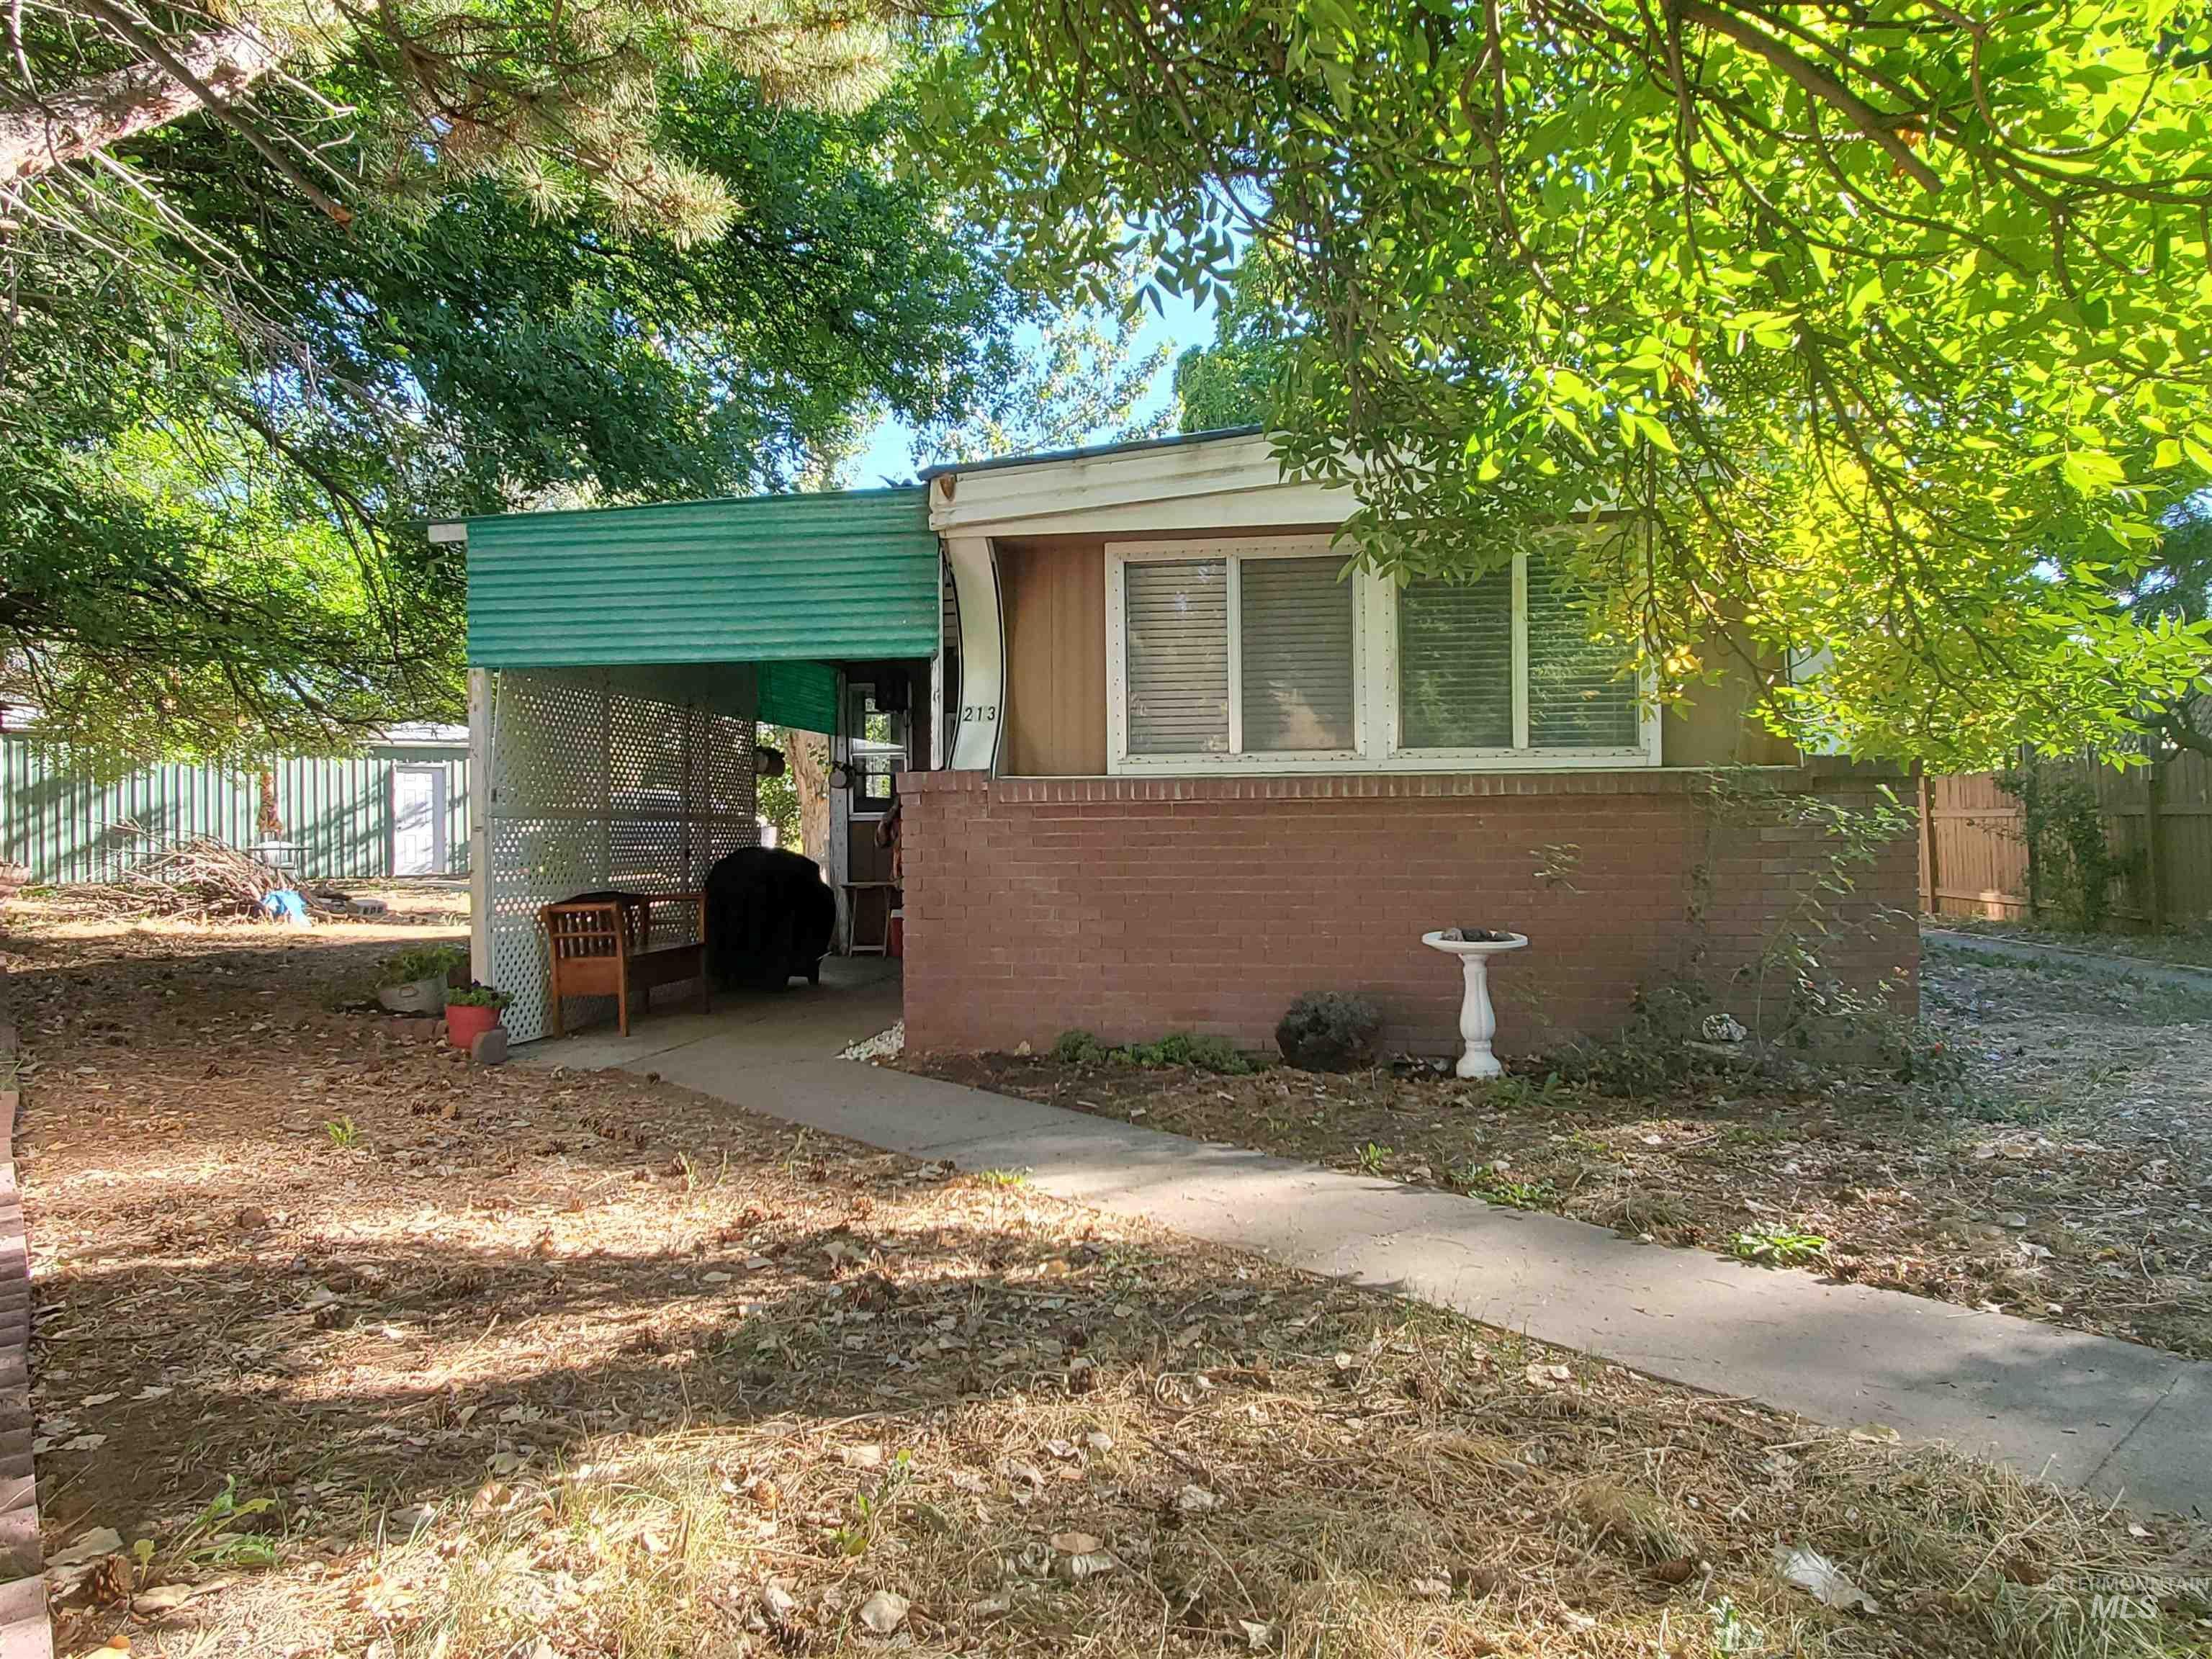 213 W Ave D Property Photo